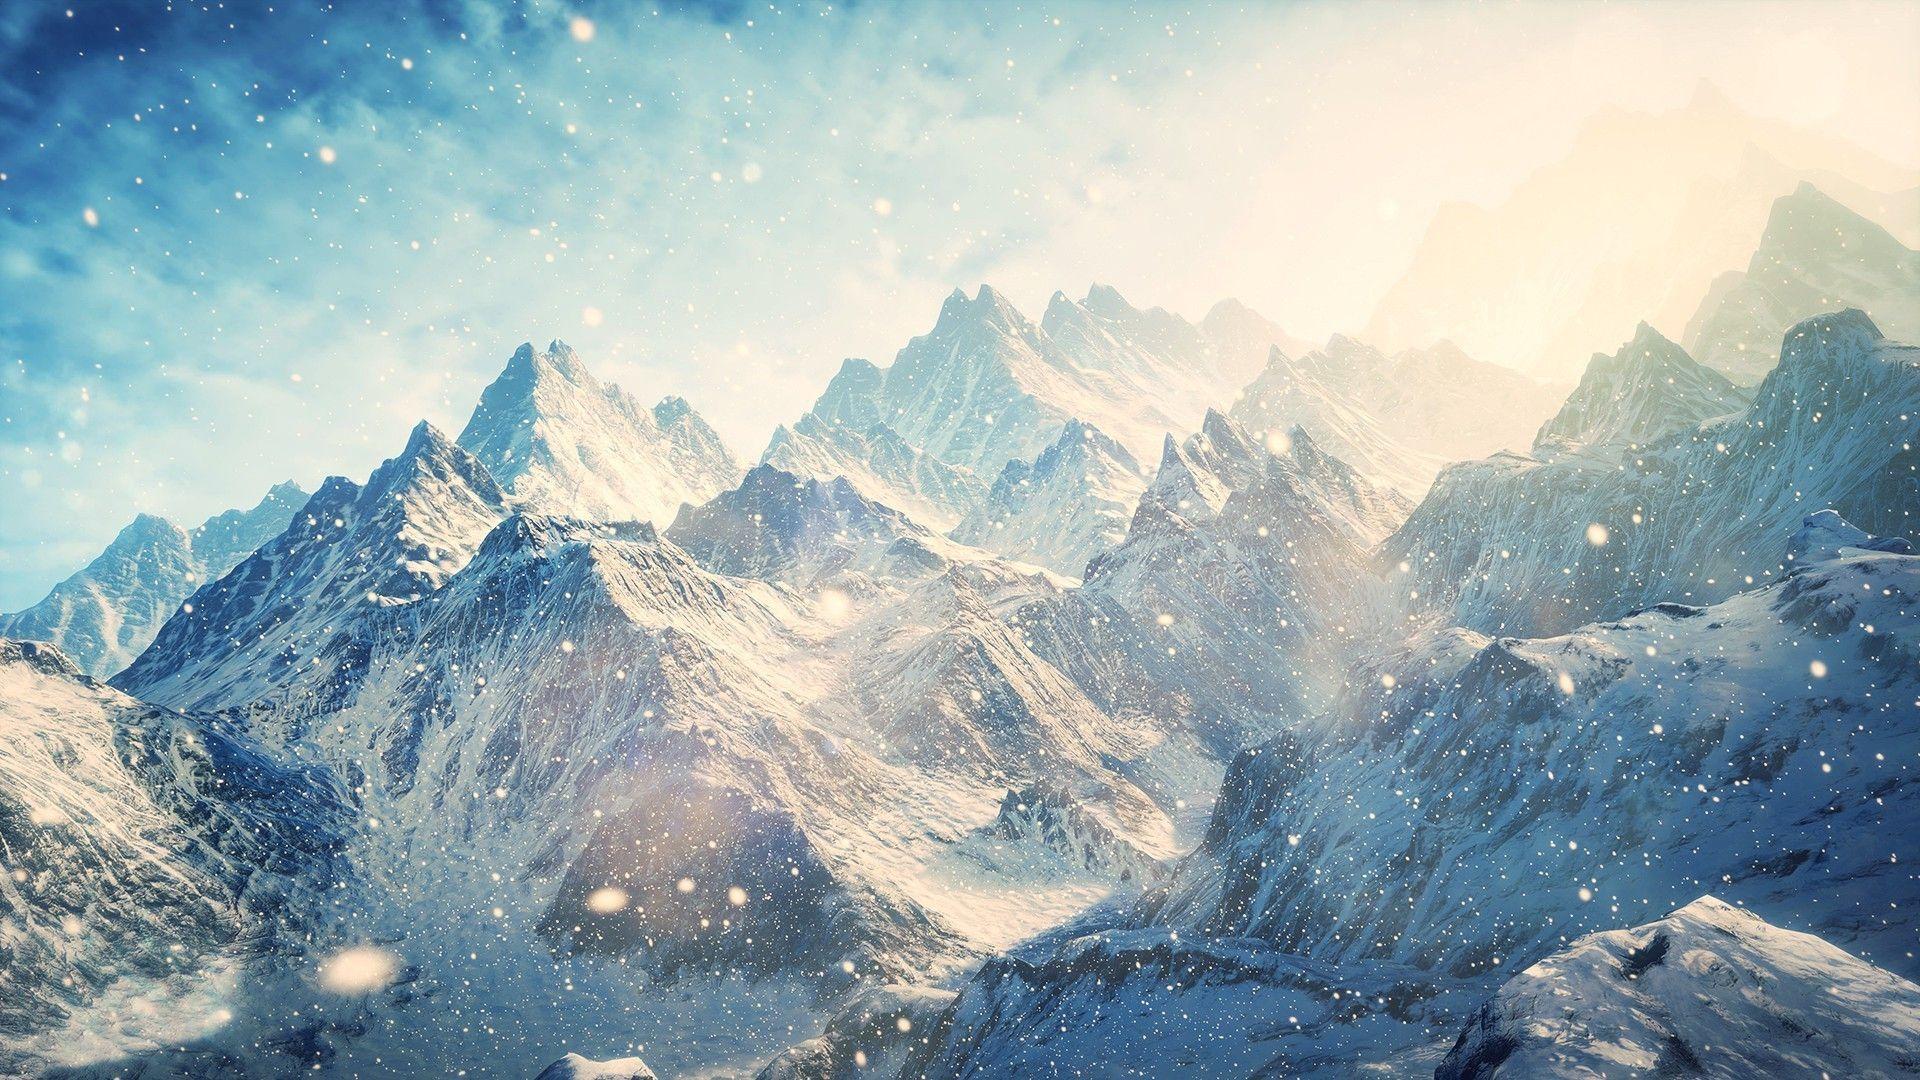 1920x1080 Mountain Wallpapers Top Free 1920x1080 Mountain